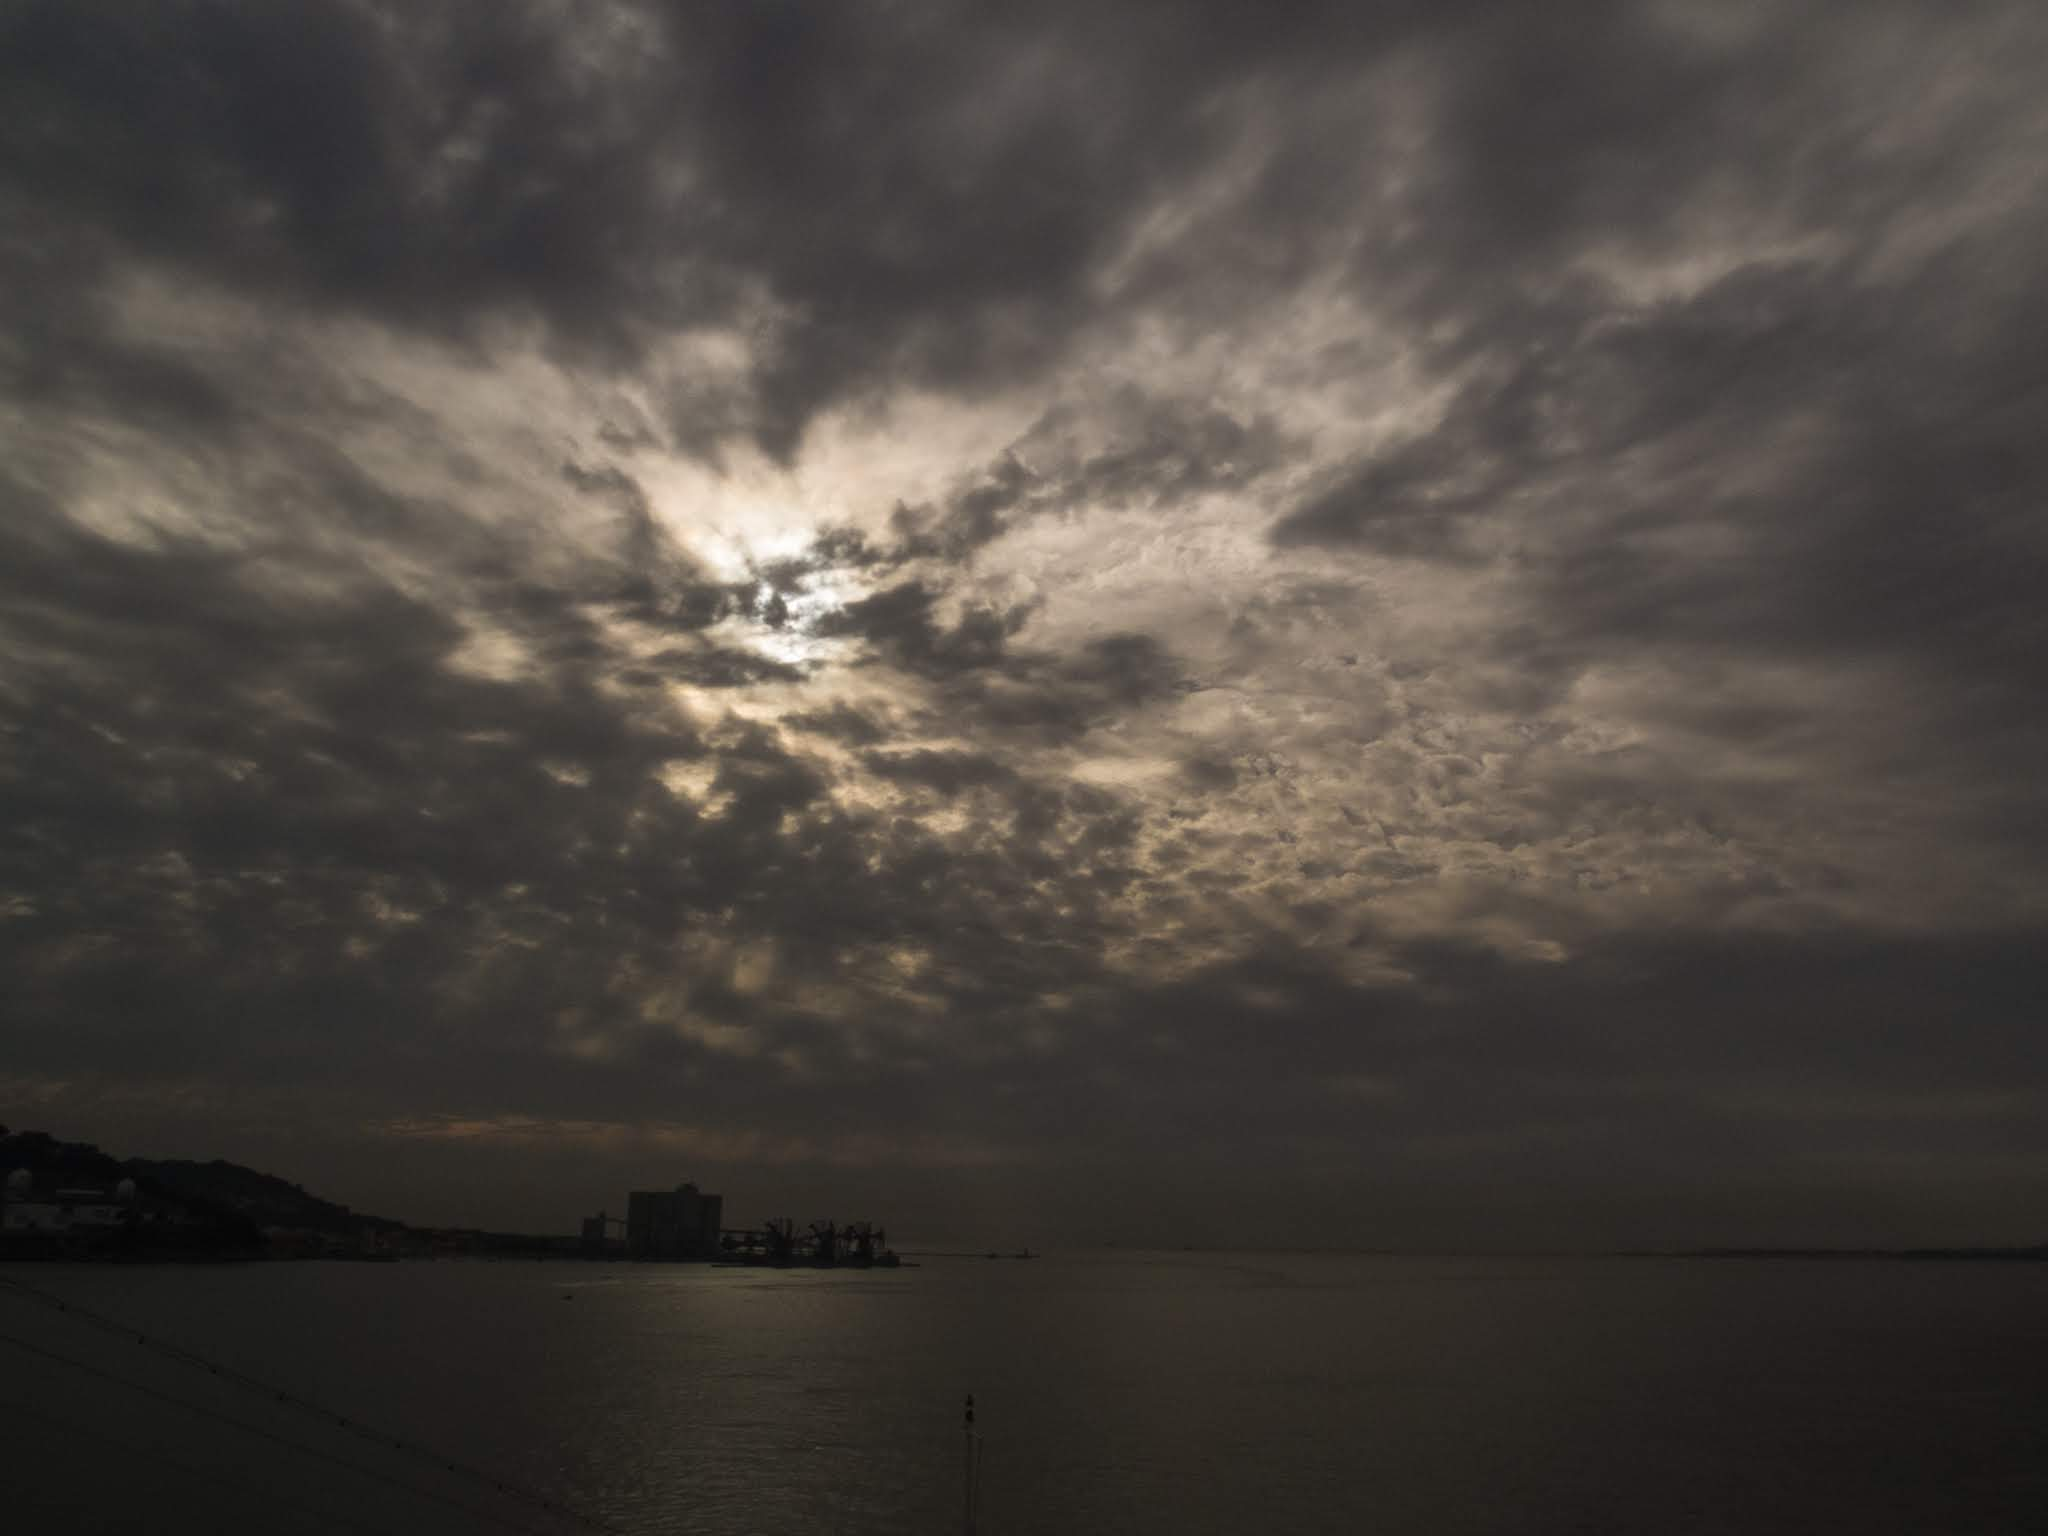 Sun breaking through clouds over an estuary in Lisbon.